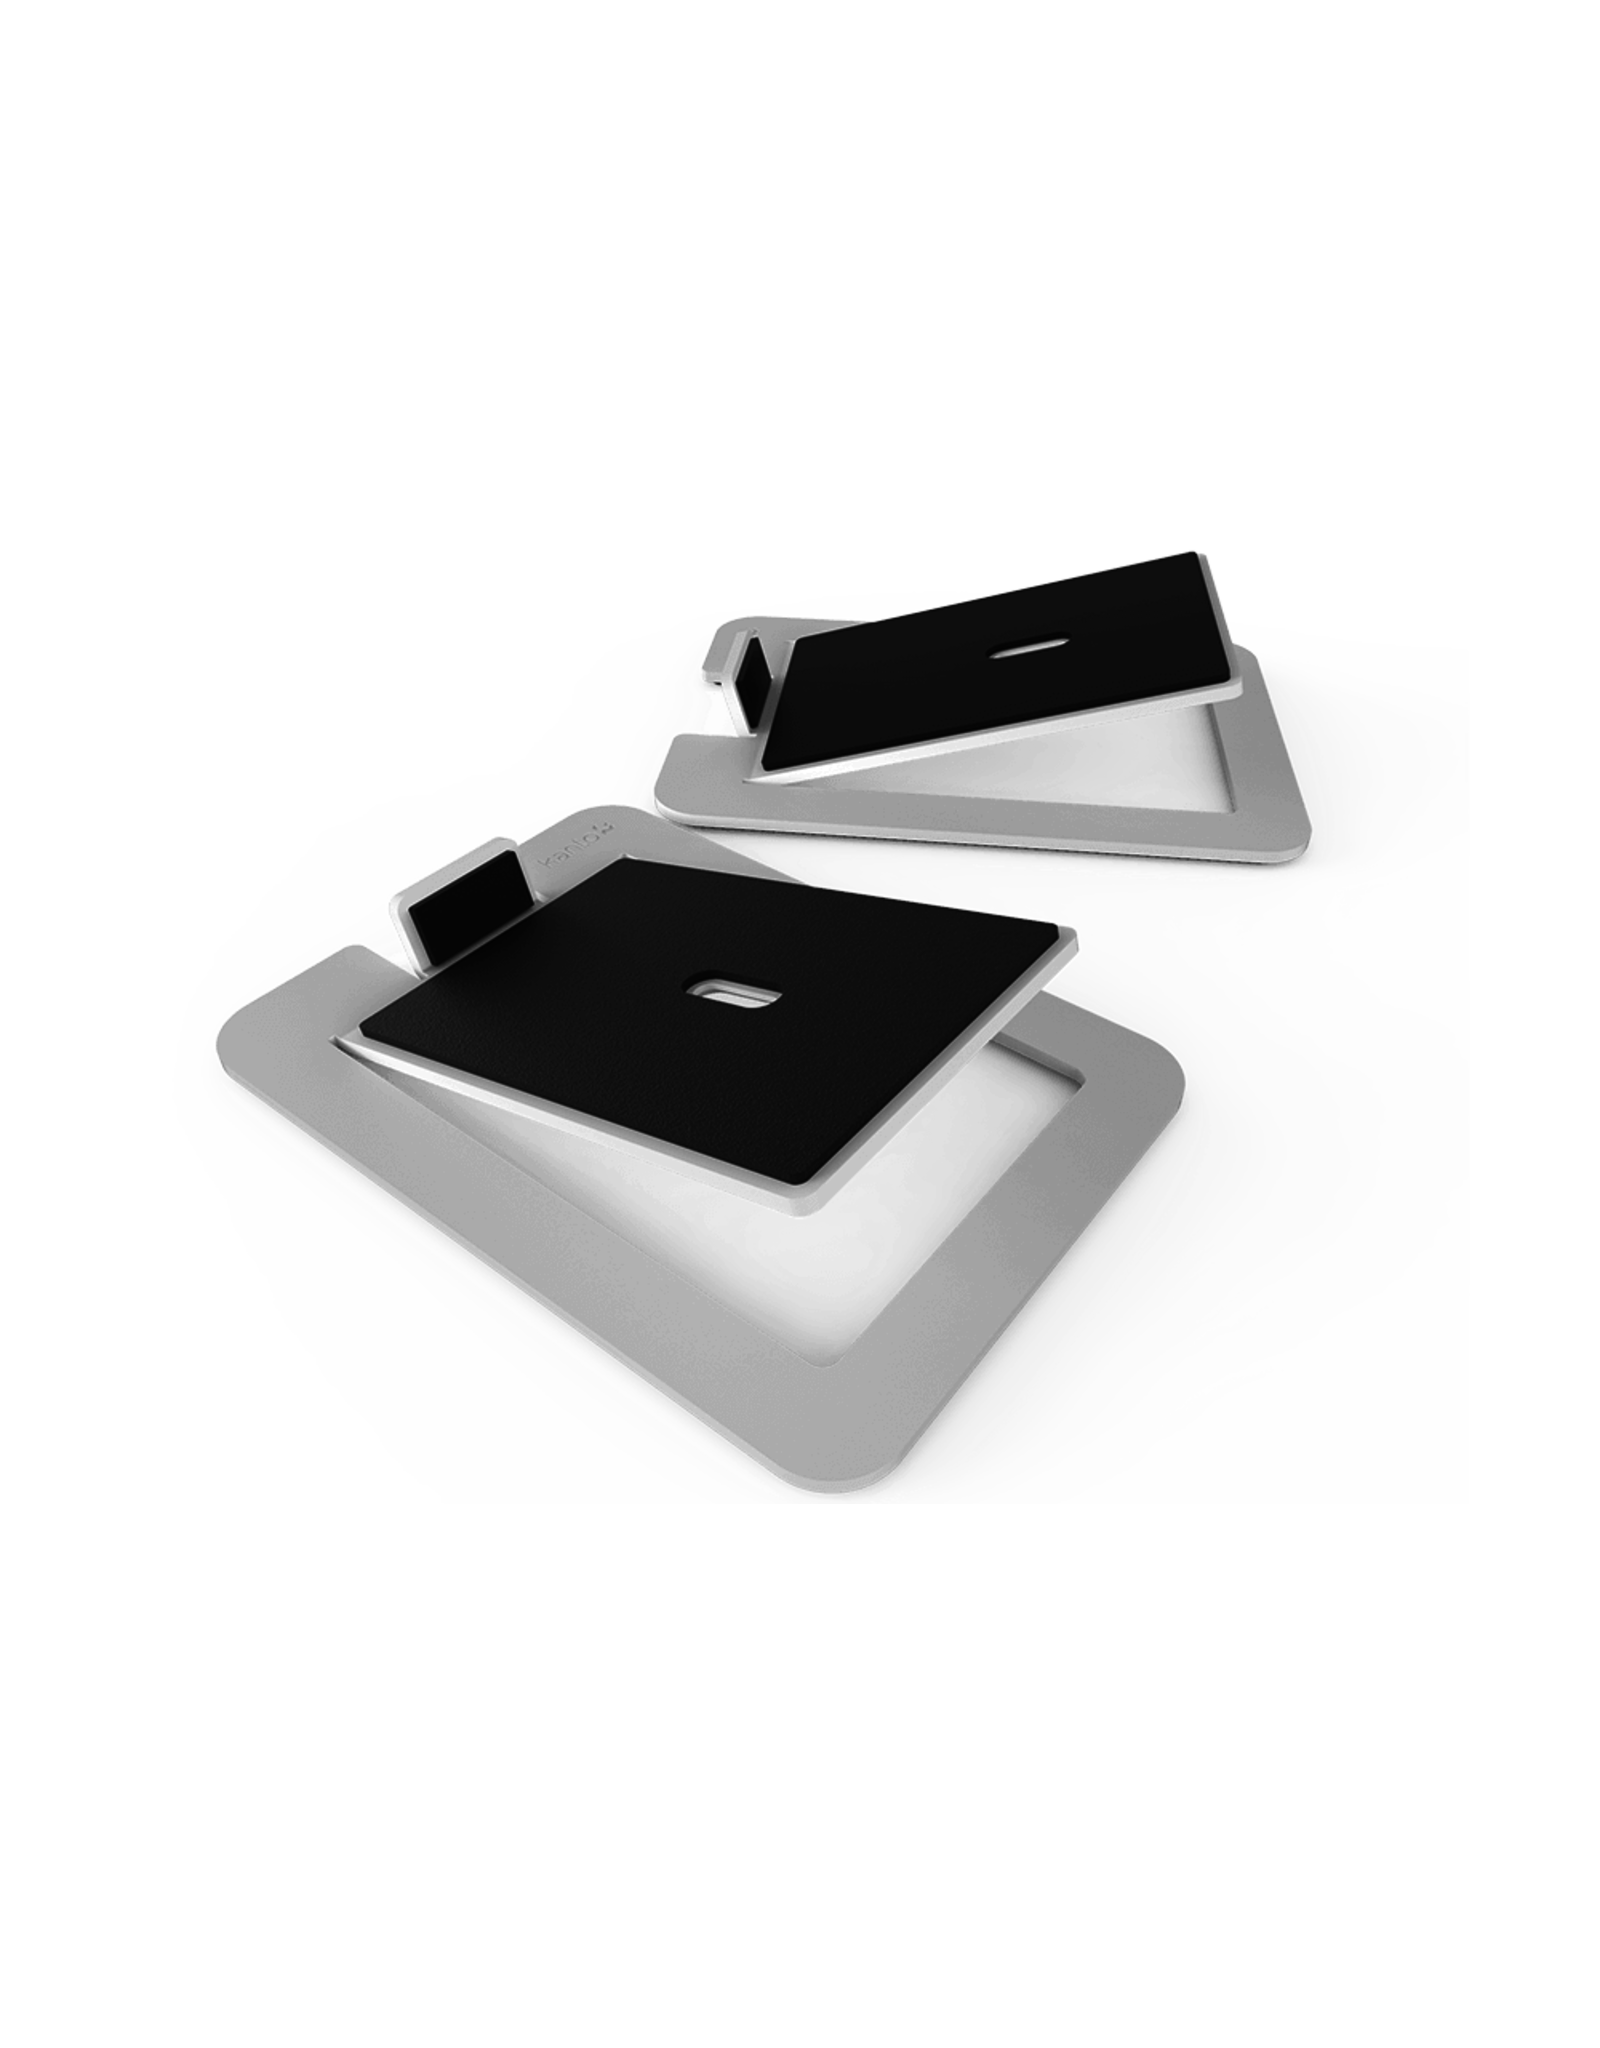 Kanto Kanto S6 Desktop Speaker Stands